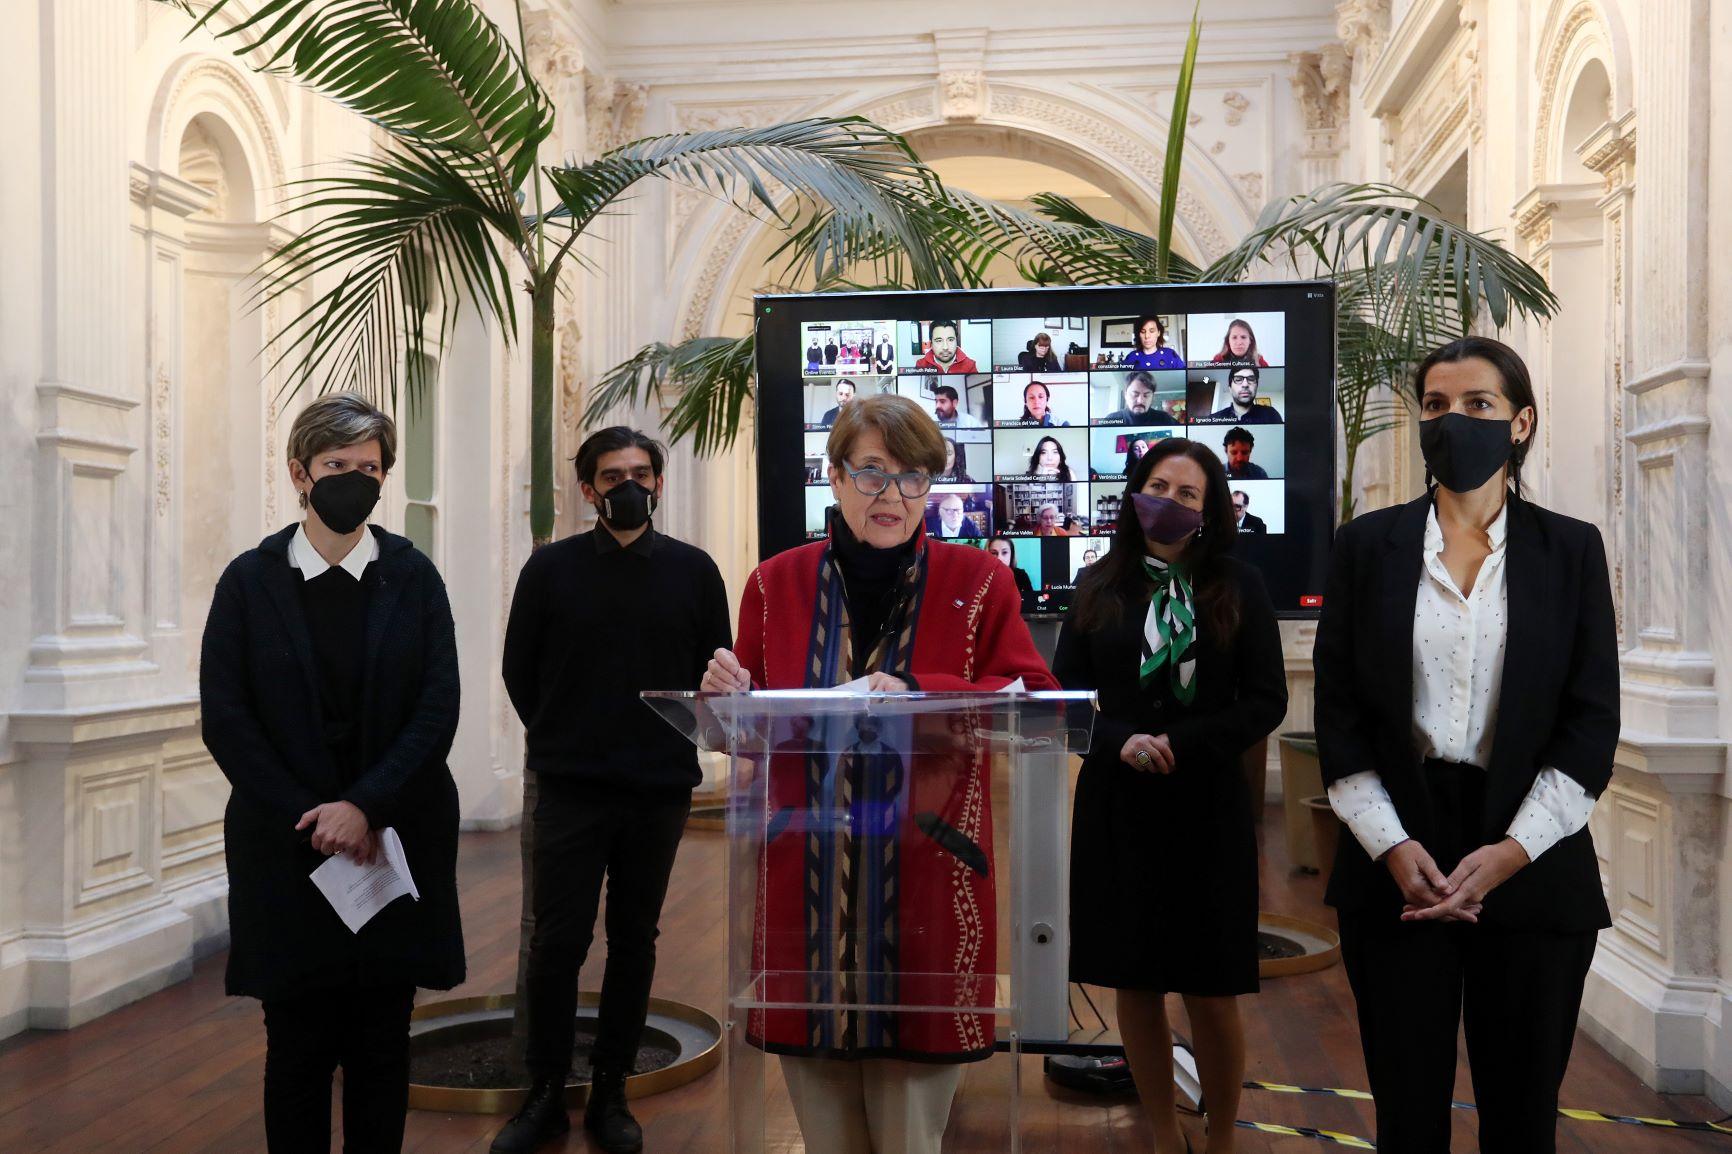 Red de fibra óptica conectará a 100 centros culturales del país